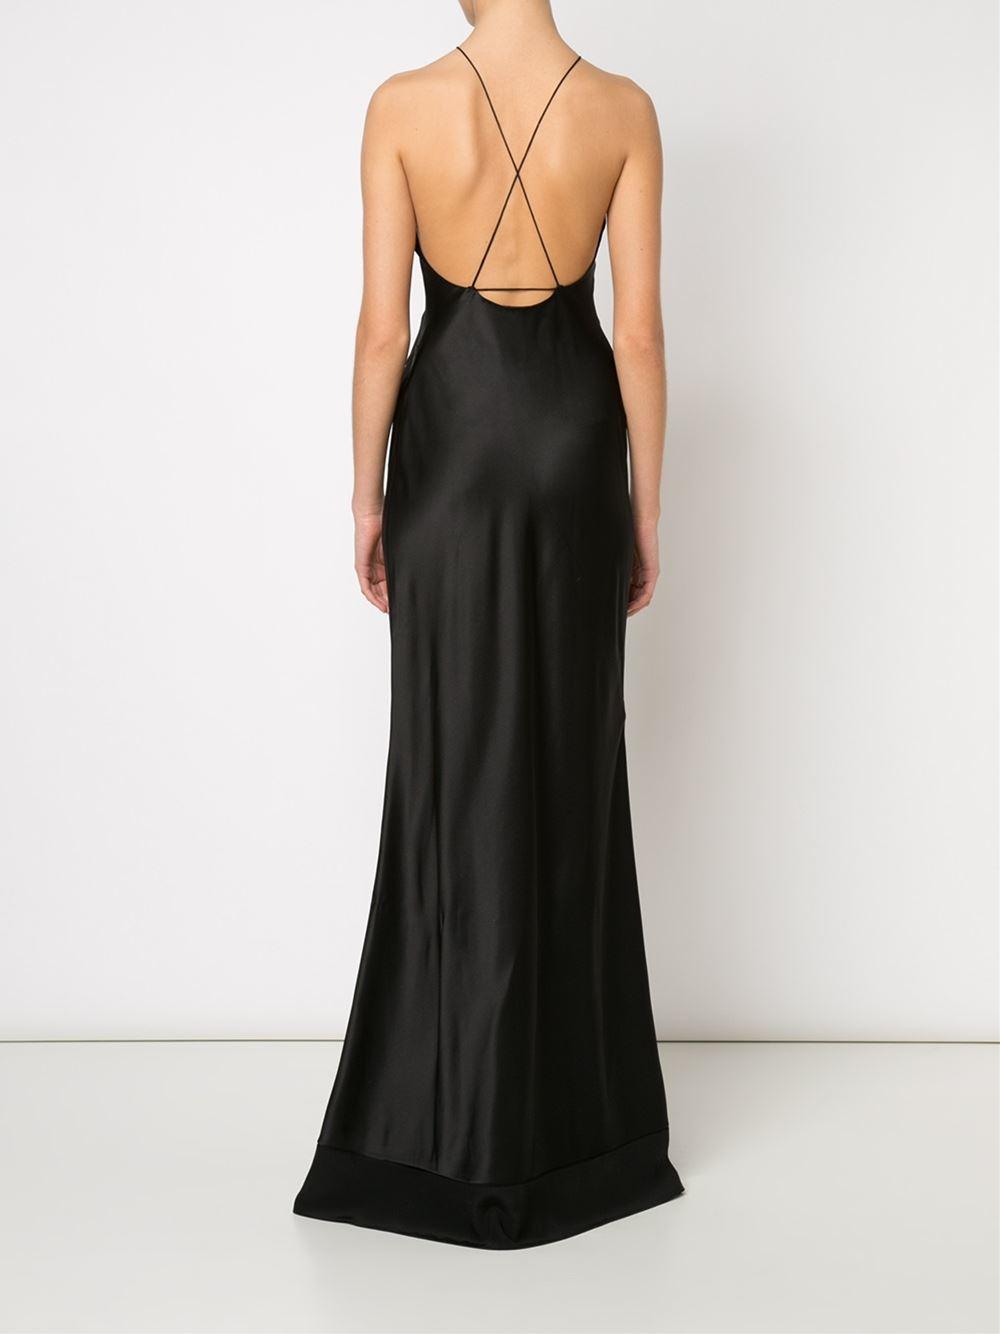 Lyst Calvin Klein Fawn Evening Dress In Black